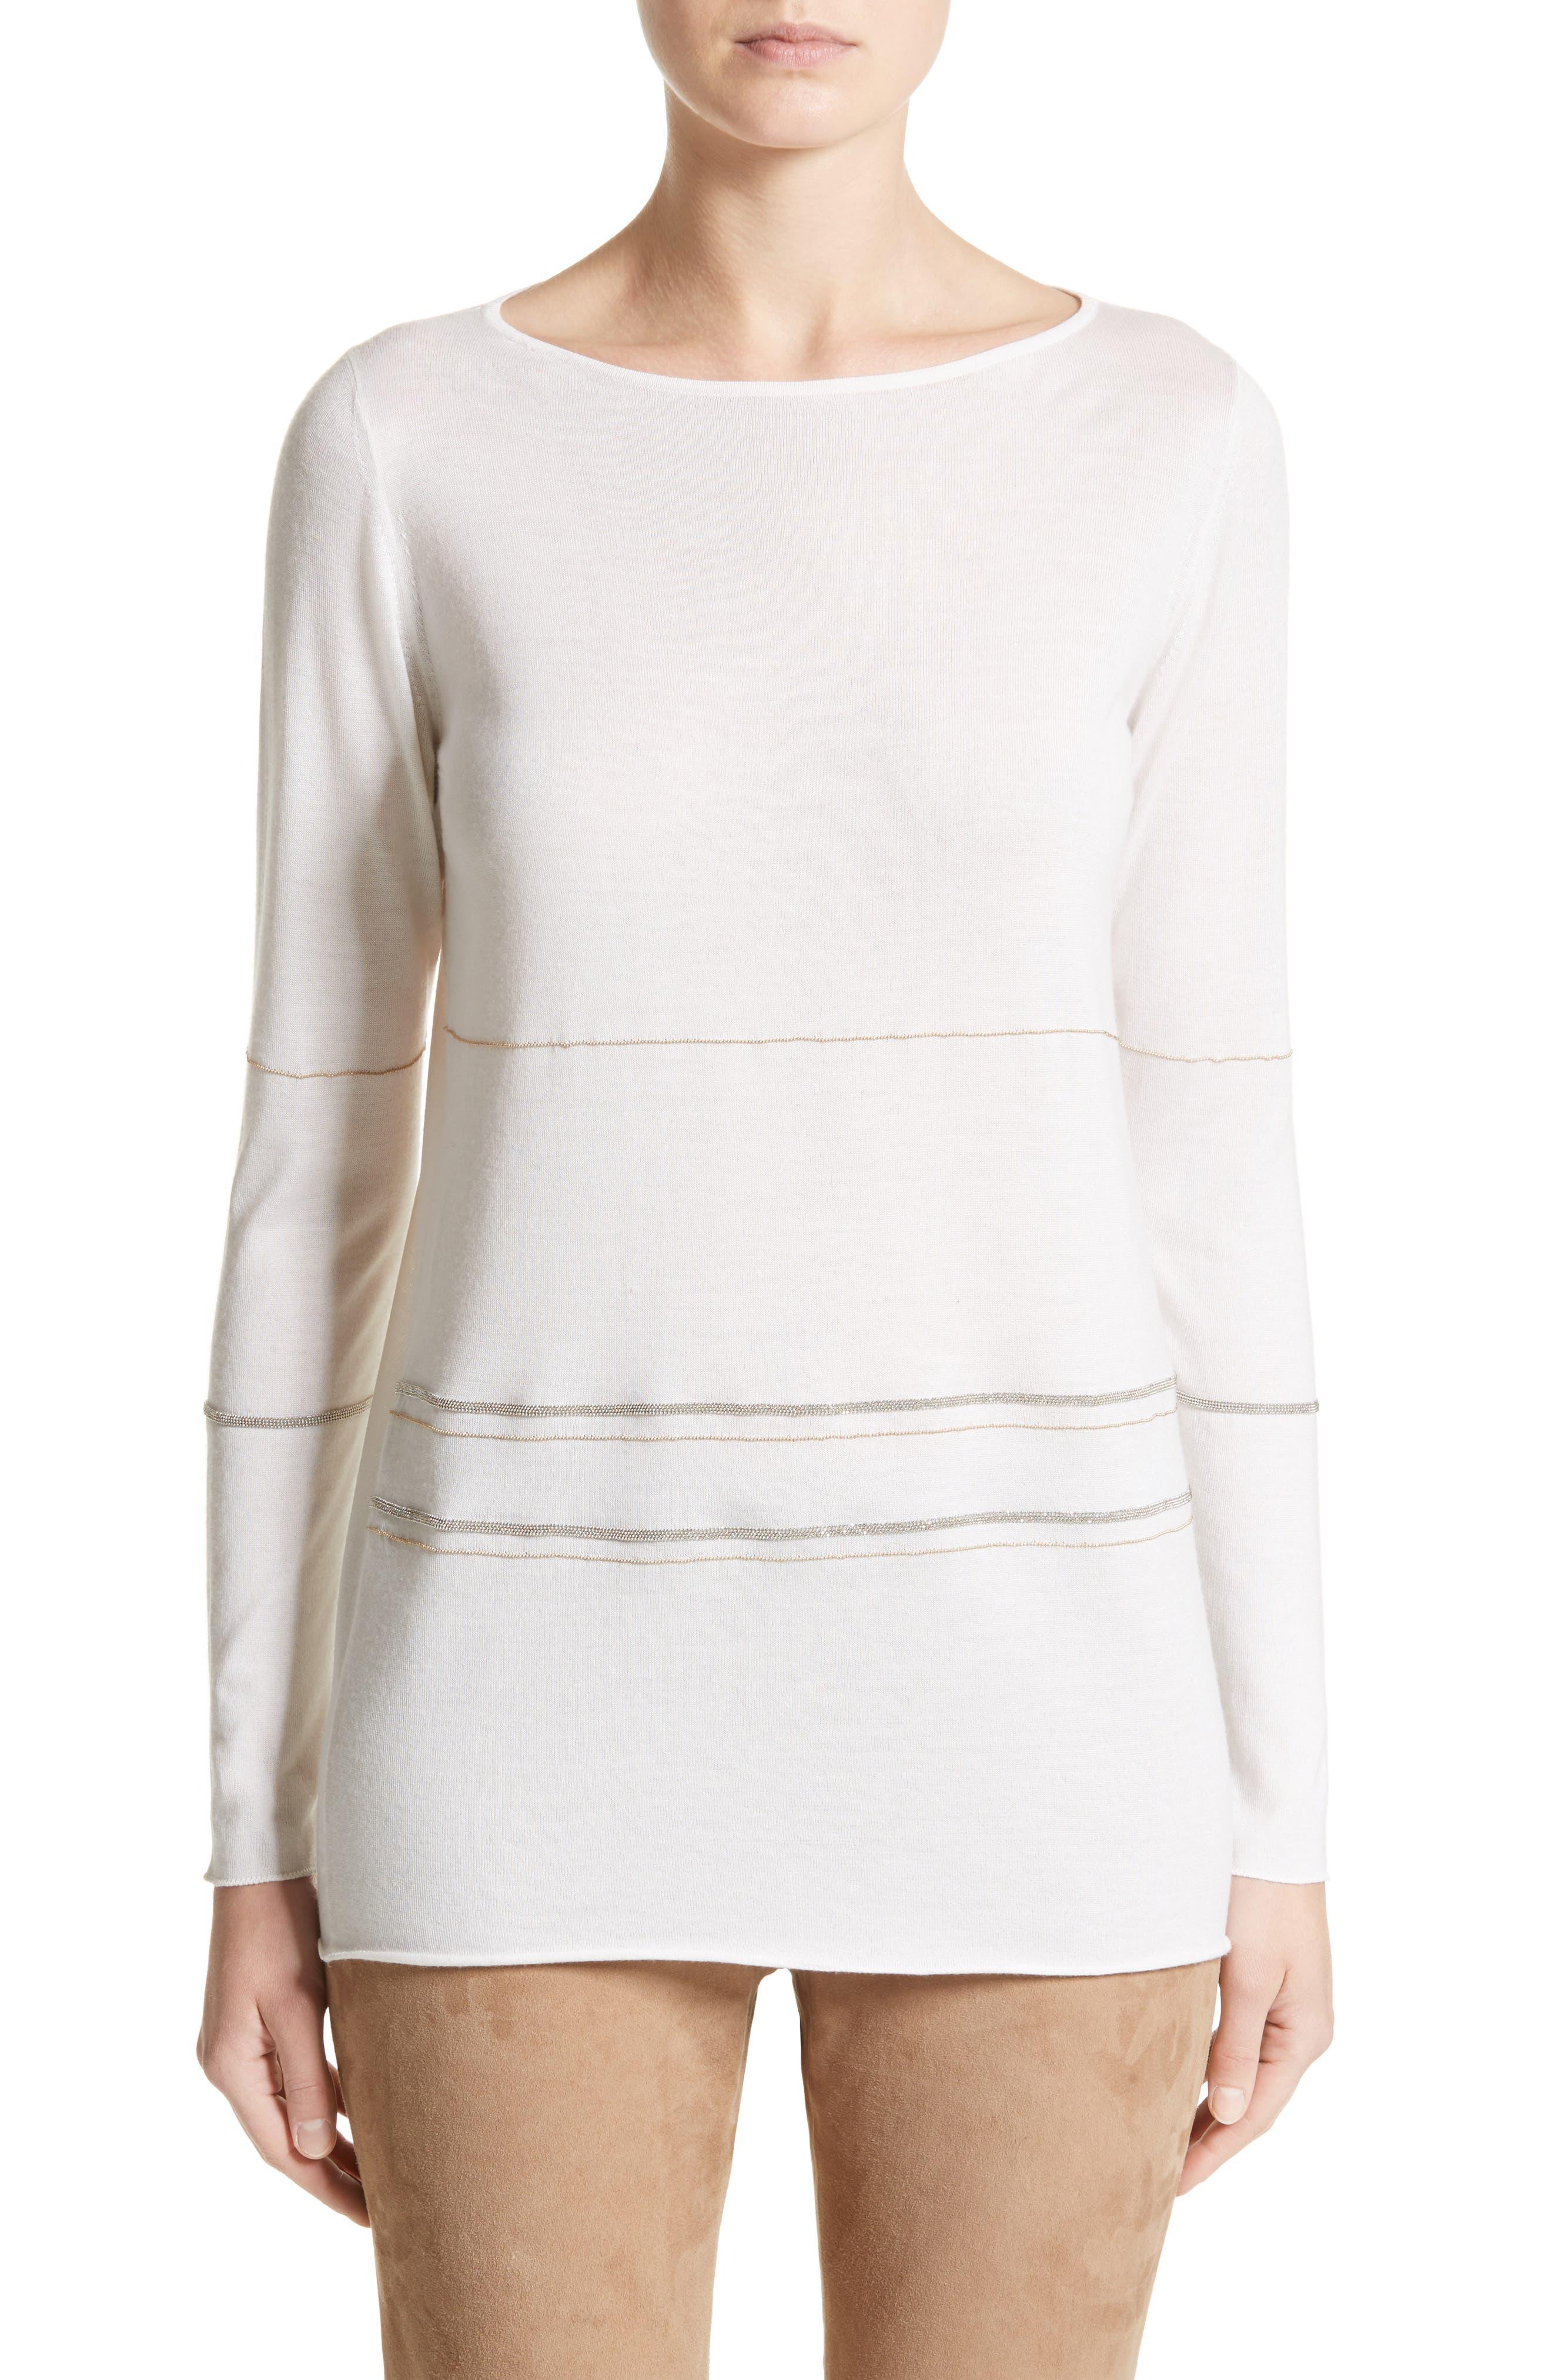 Alternate Image 1 Selected - Fabiana Filippi Metallic Trim Cashmere & Silk Sweater